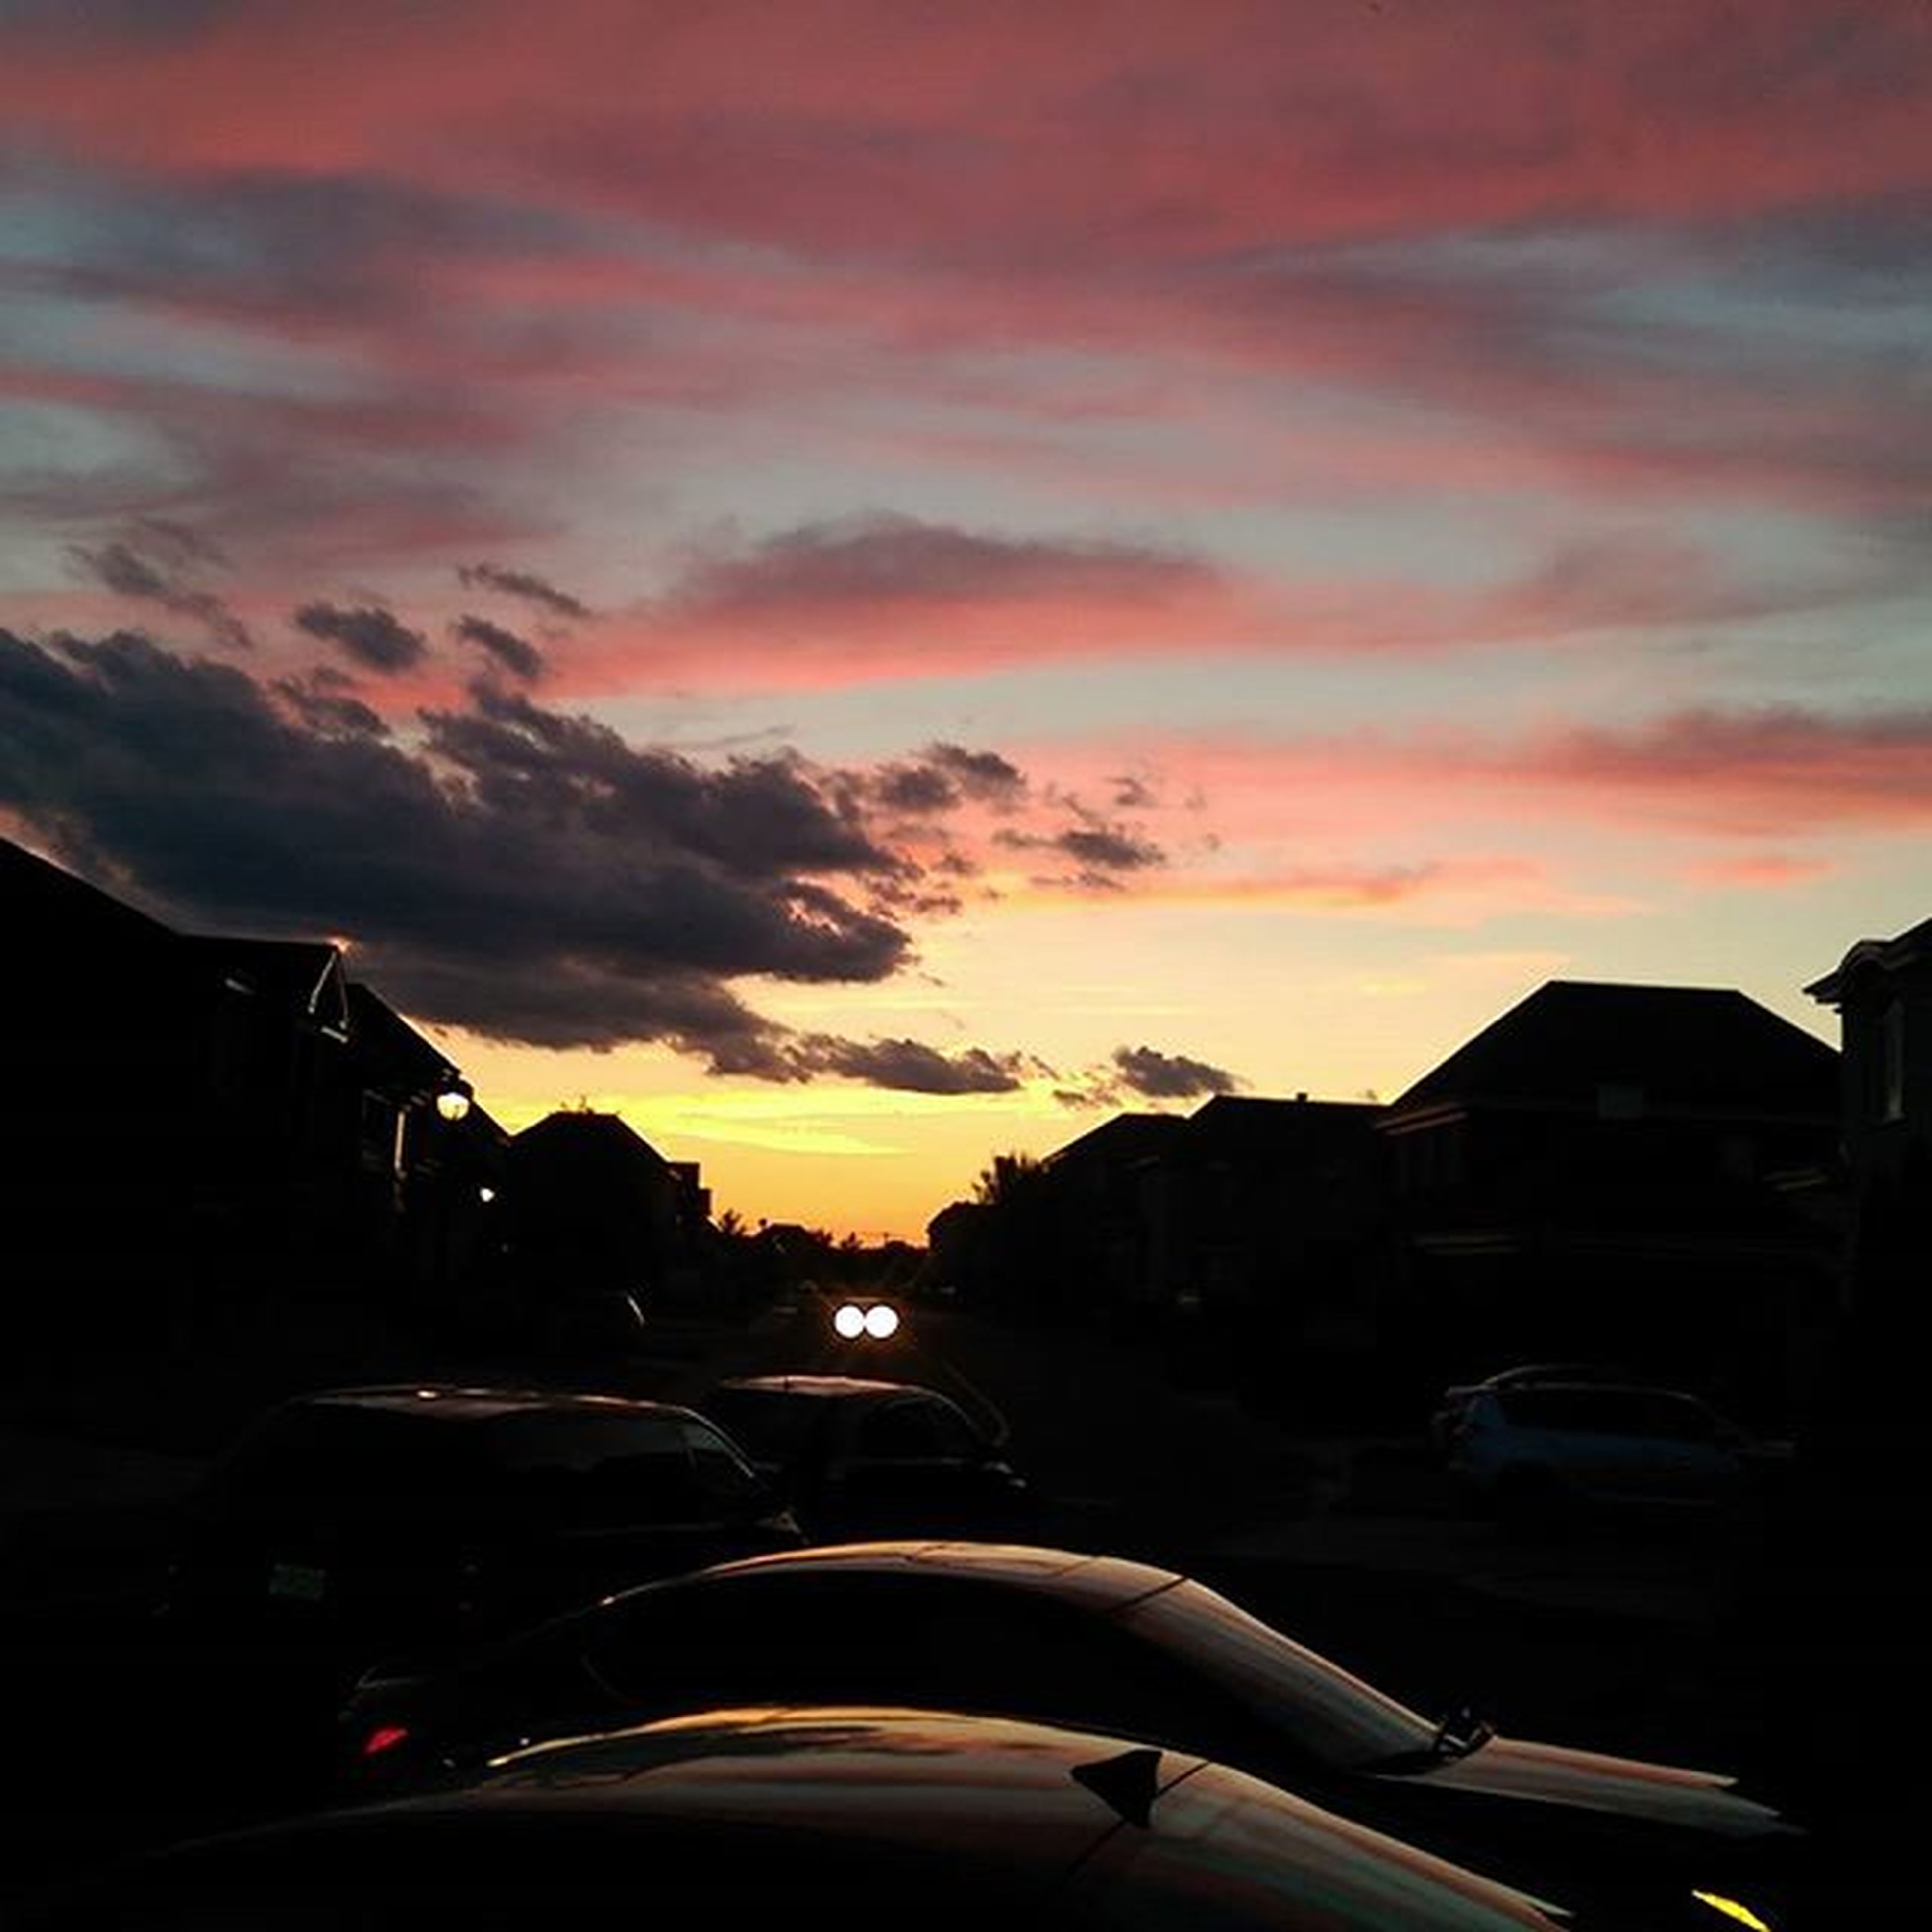 sunset, transportation, car, mode of transport, land vehicle, sky, orange color, cloud - sky, building exterior, architecture, road, built structure, street, silhouette, cloud, city, dramatic sky, cloudy, dusk, travel